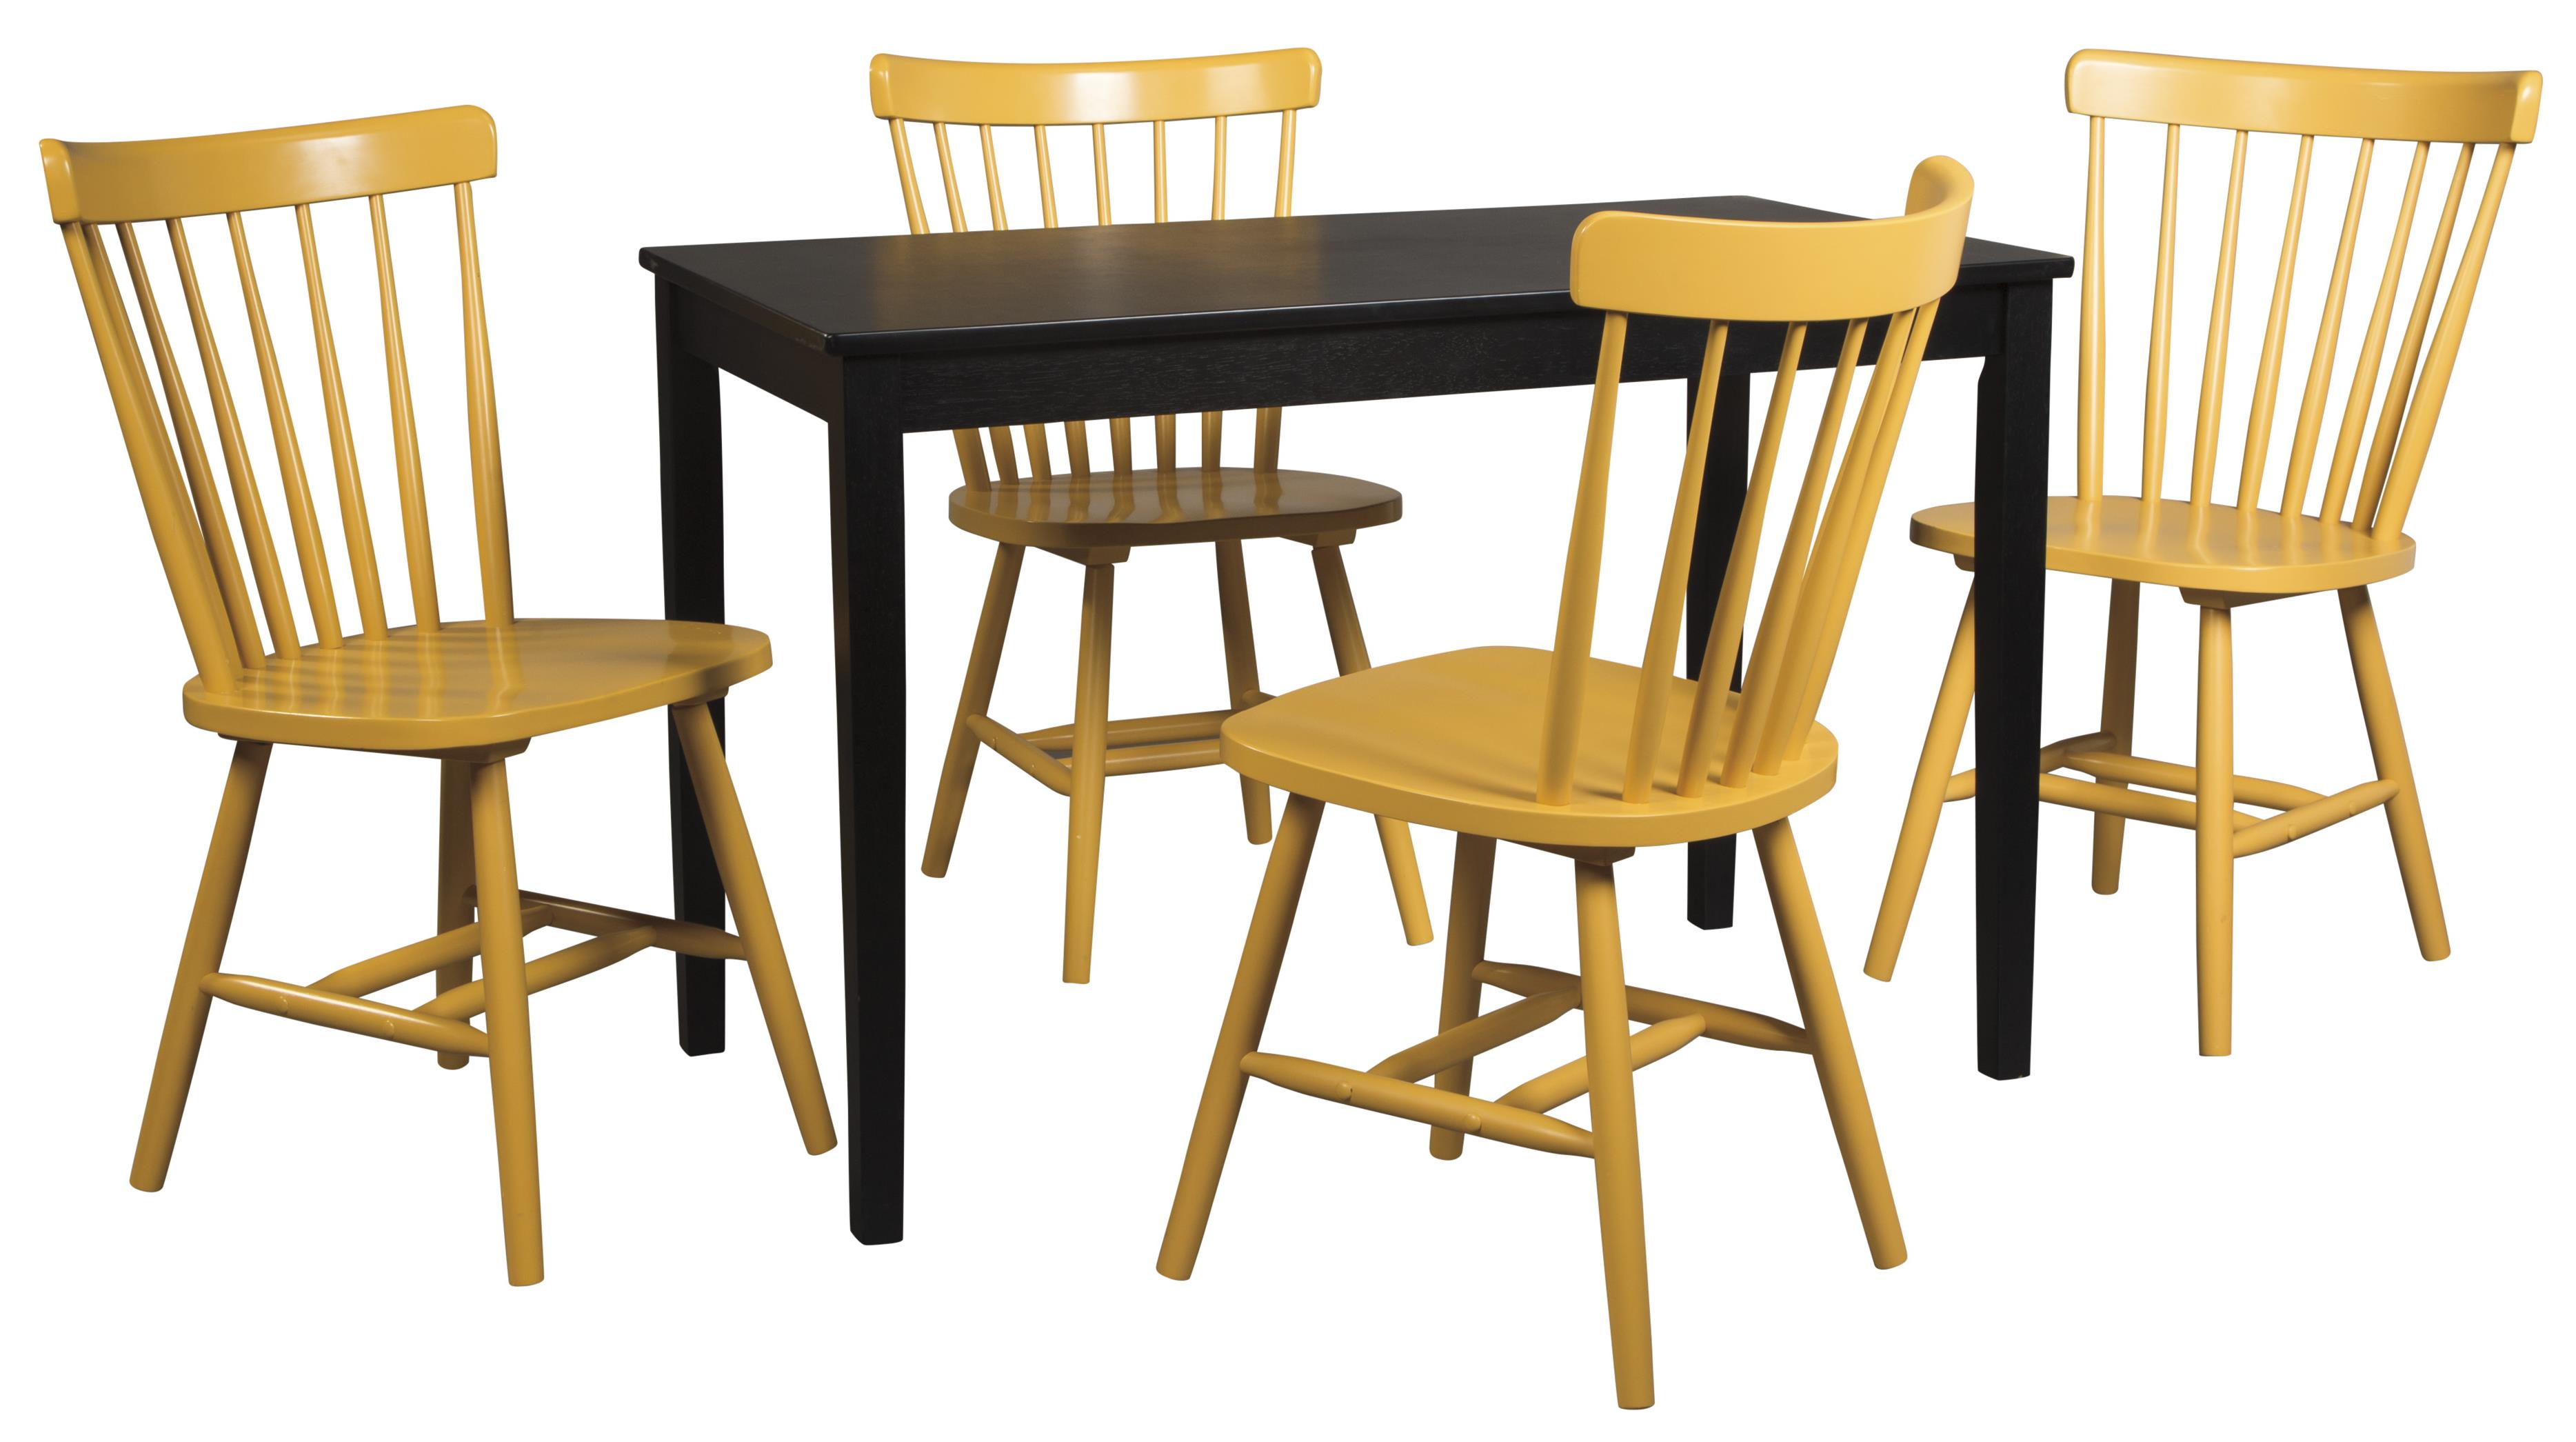 Signature Design by Ashley Kimonte 5-Piece Rectangular Table Set - Item Number: D250-25+4xD389-04